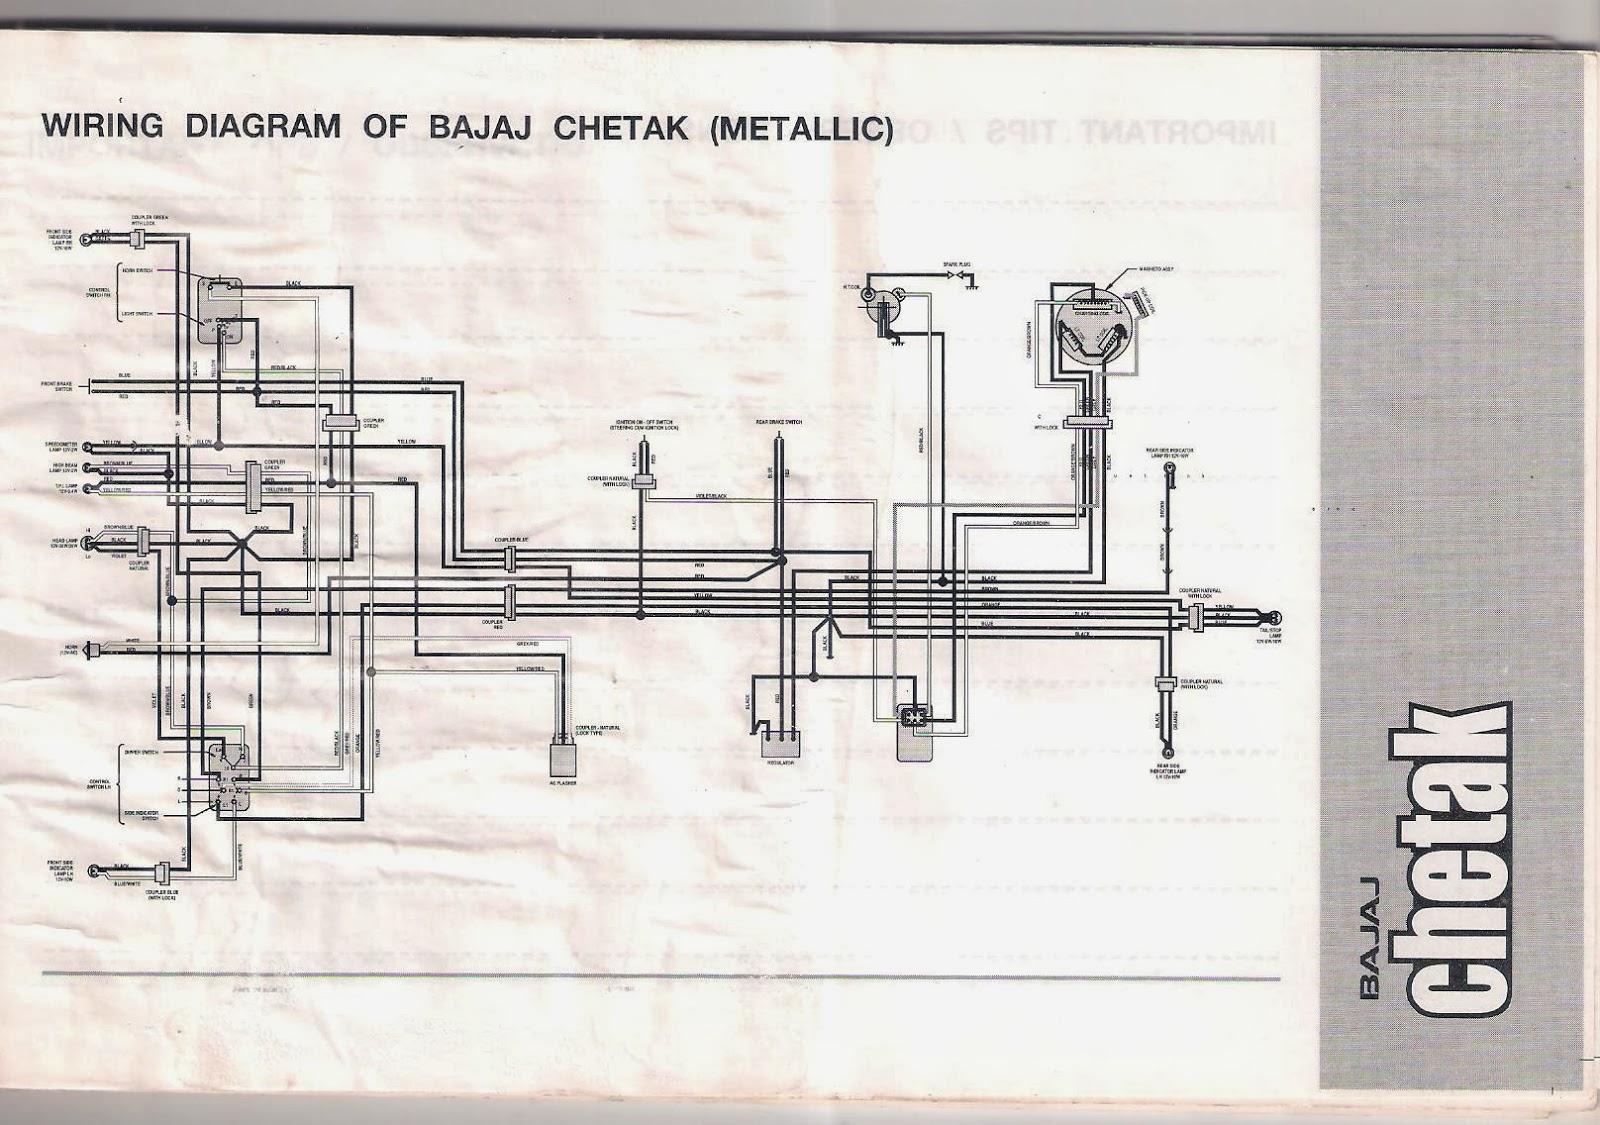 bajaj chetak wiring diagram wiring library bajaj chetak 2005 model owners manual [ 1600 x 1125 Pixel ]